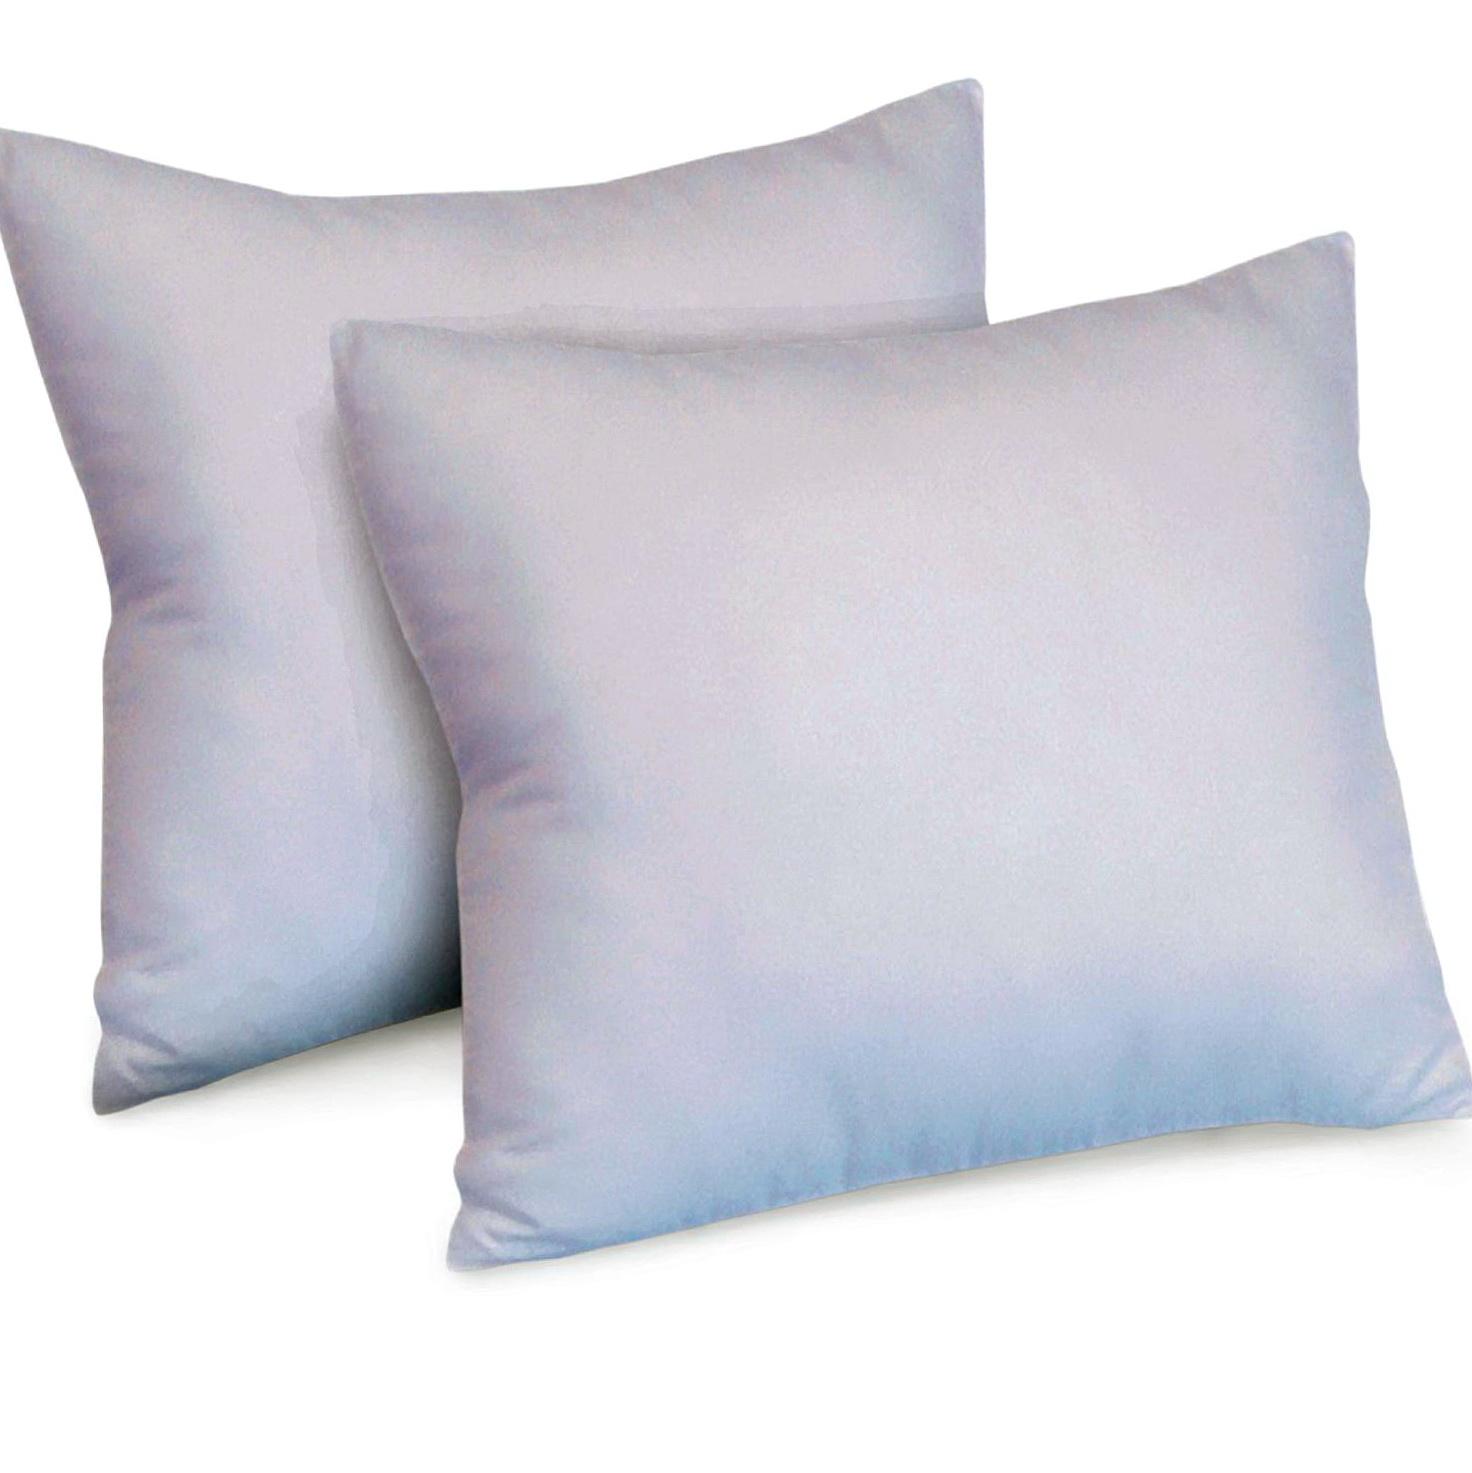 Foam For Cushions Amazon